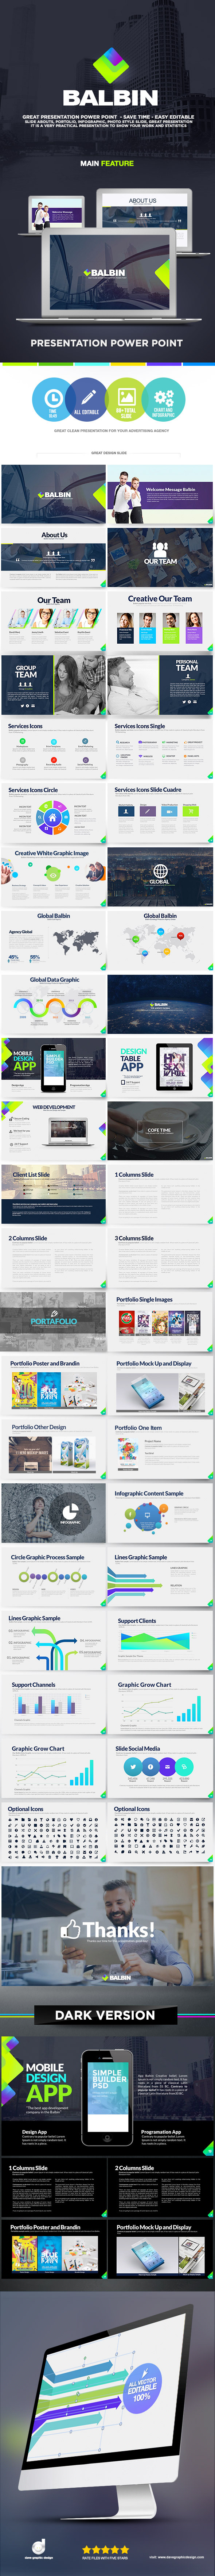 Balbin Presentation Power Point - Creative PowerPoint Templates